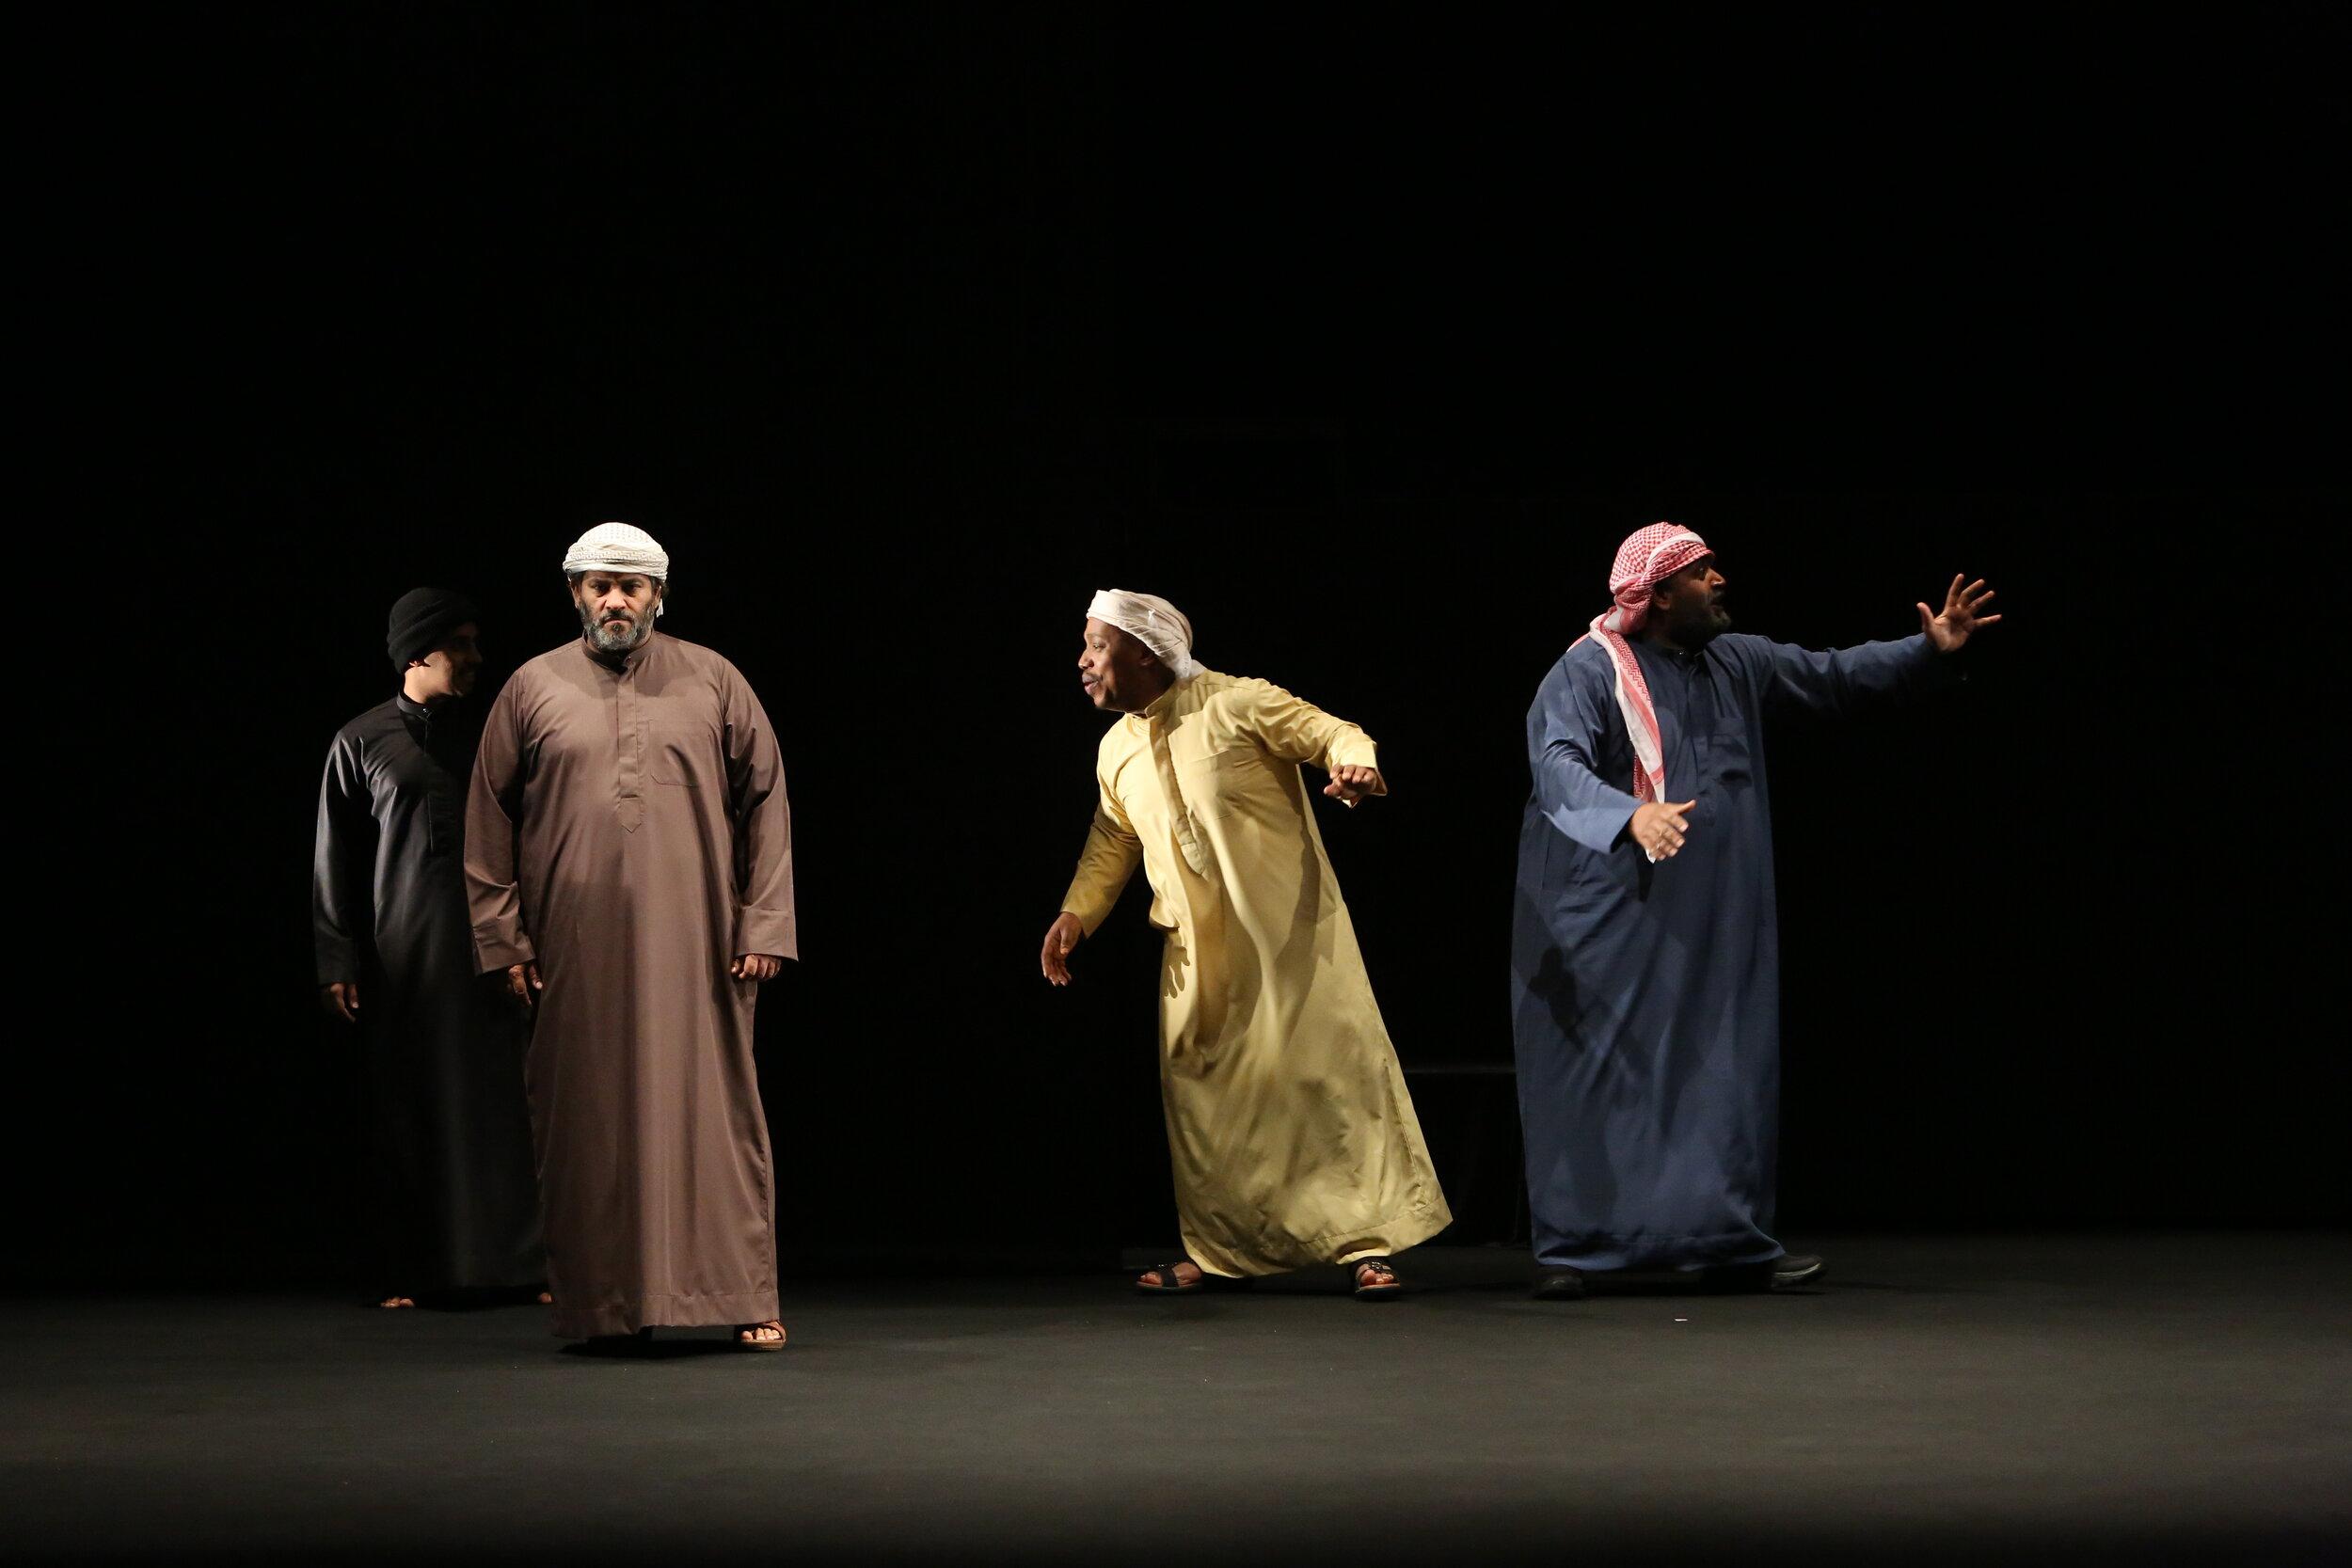 Emirati Theatre - Ahmed bint Suleiman_1.JPG